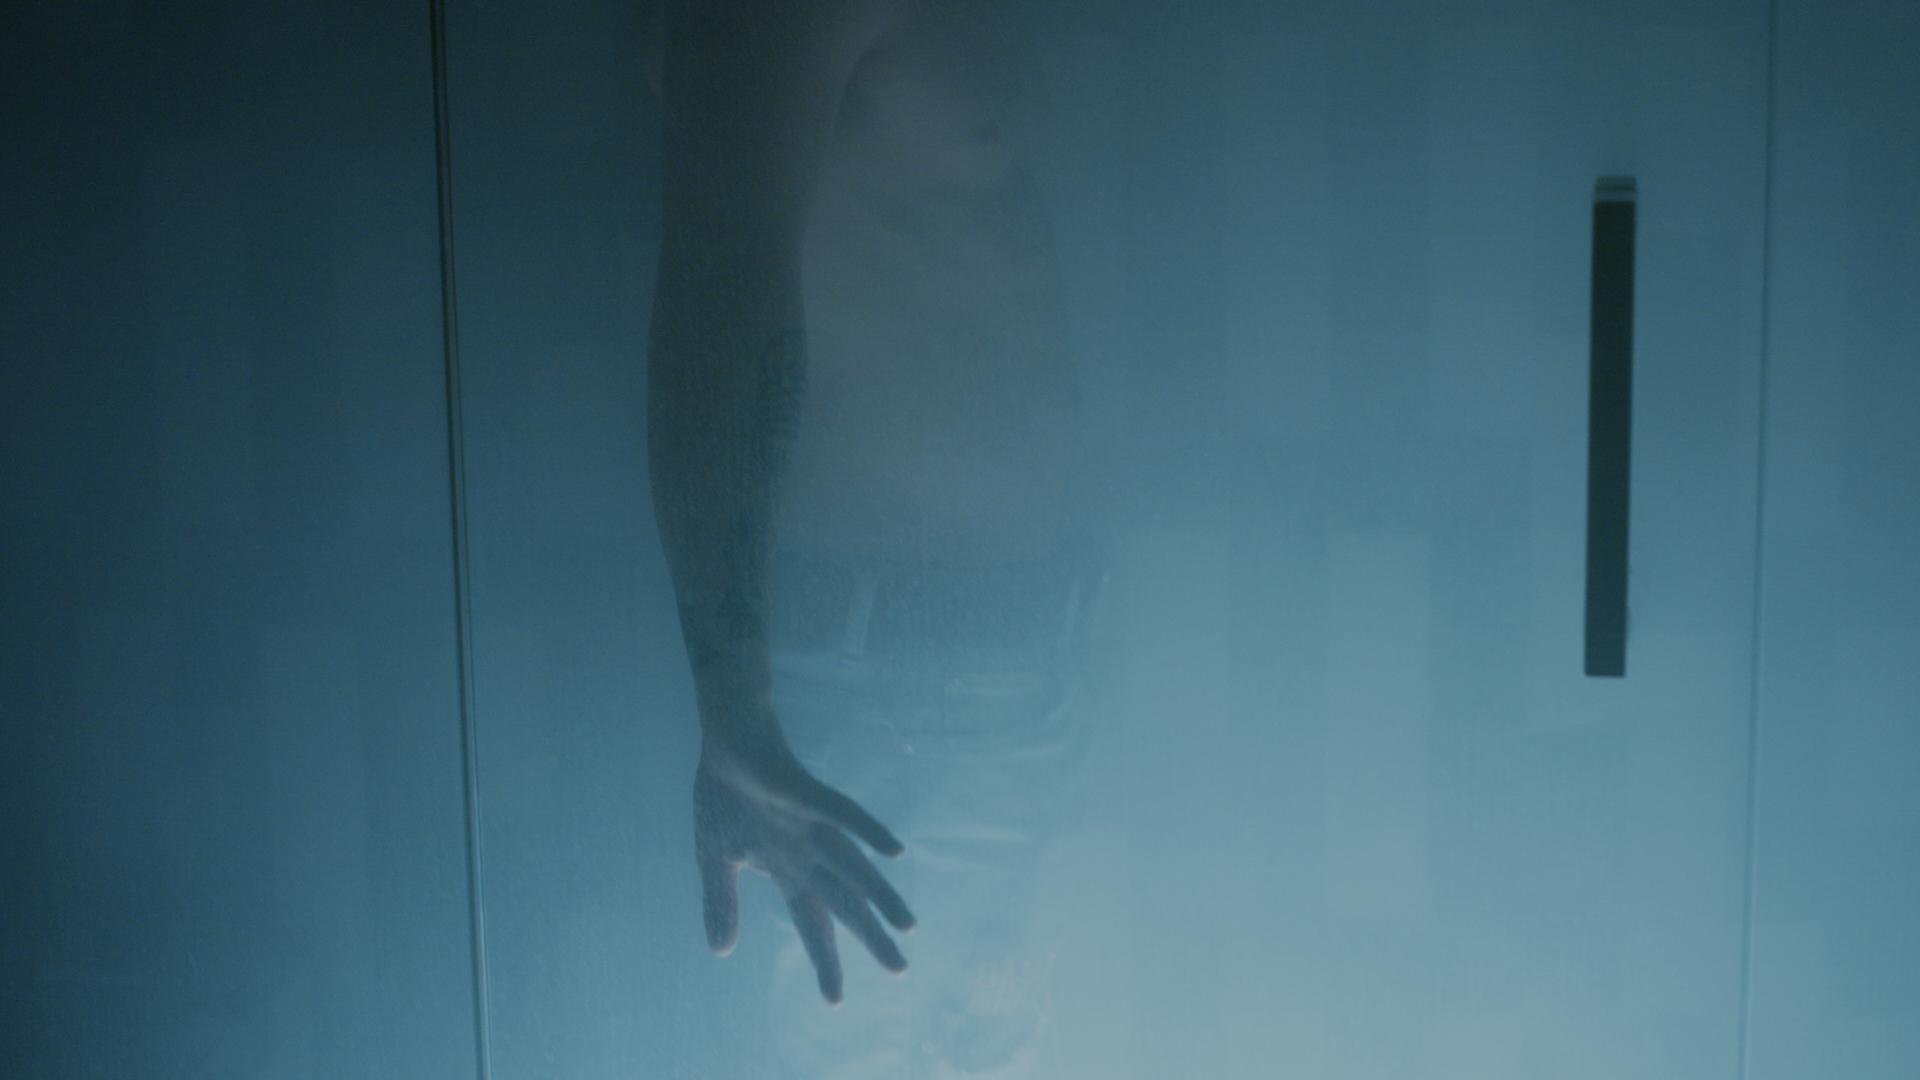 DGMV_lost_shower+hand_1.82.5.jpg